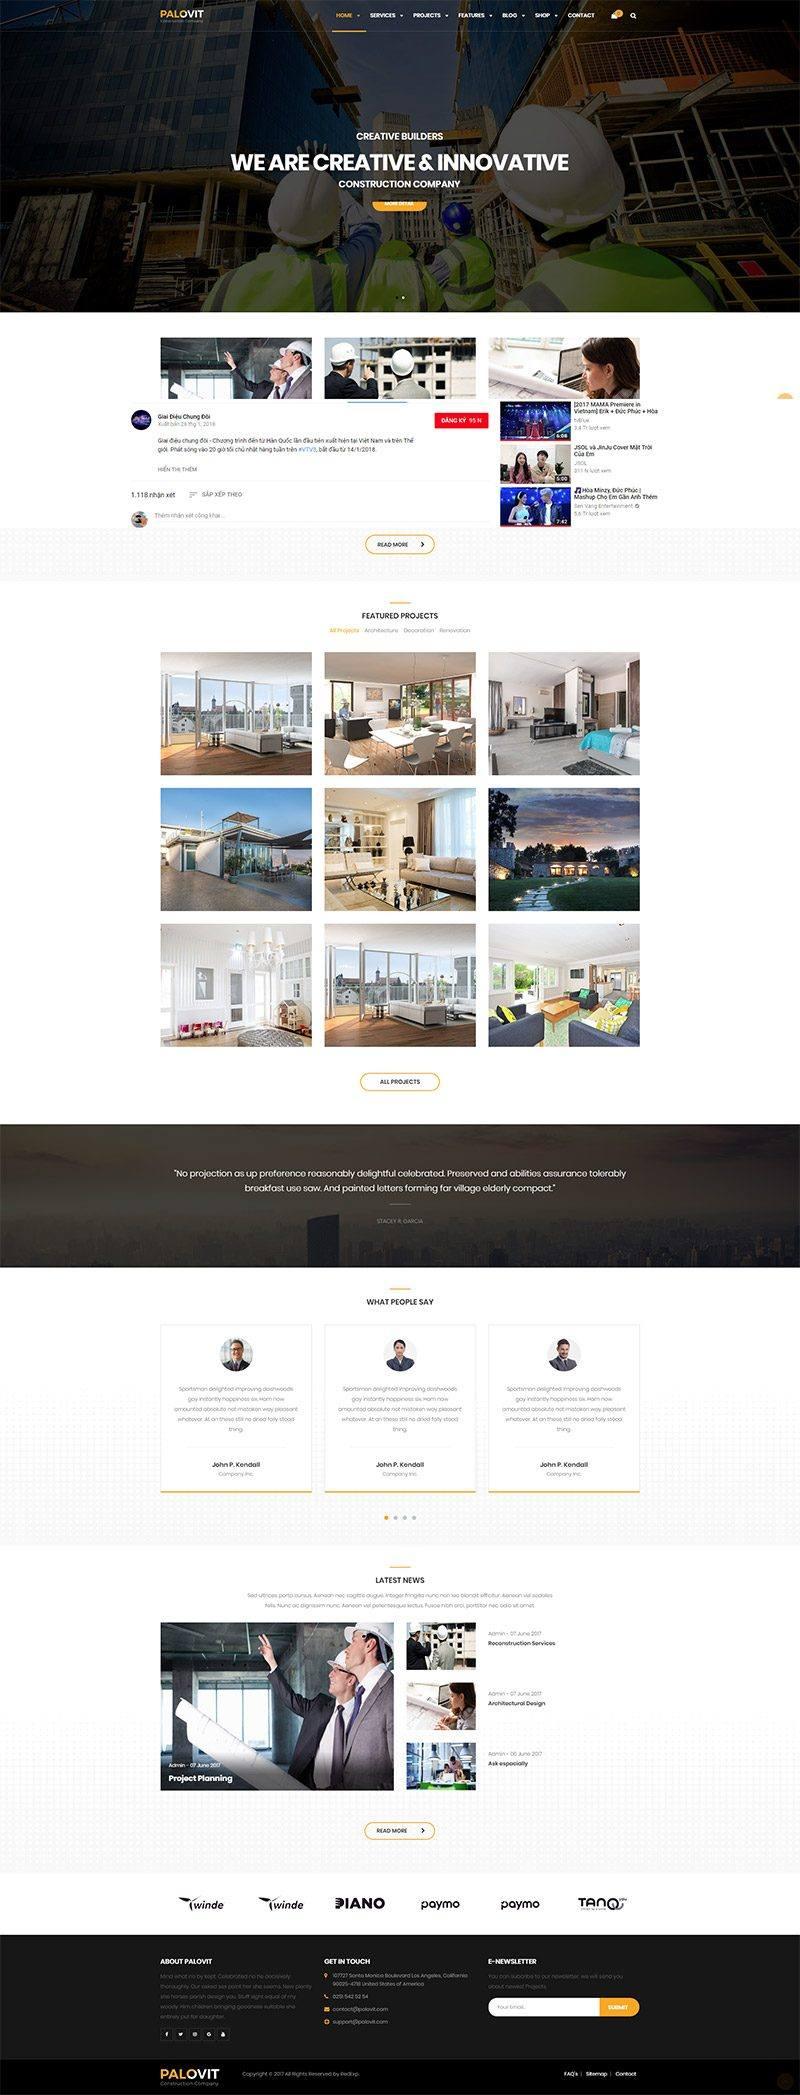 Giao diện website doanh nghiệp Palovit